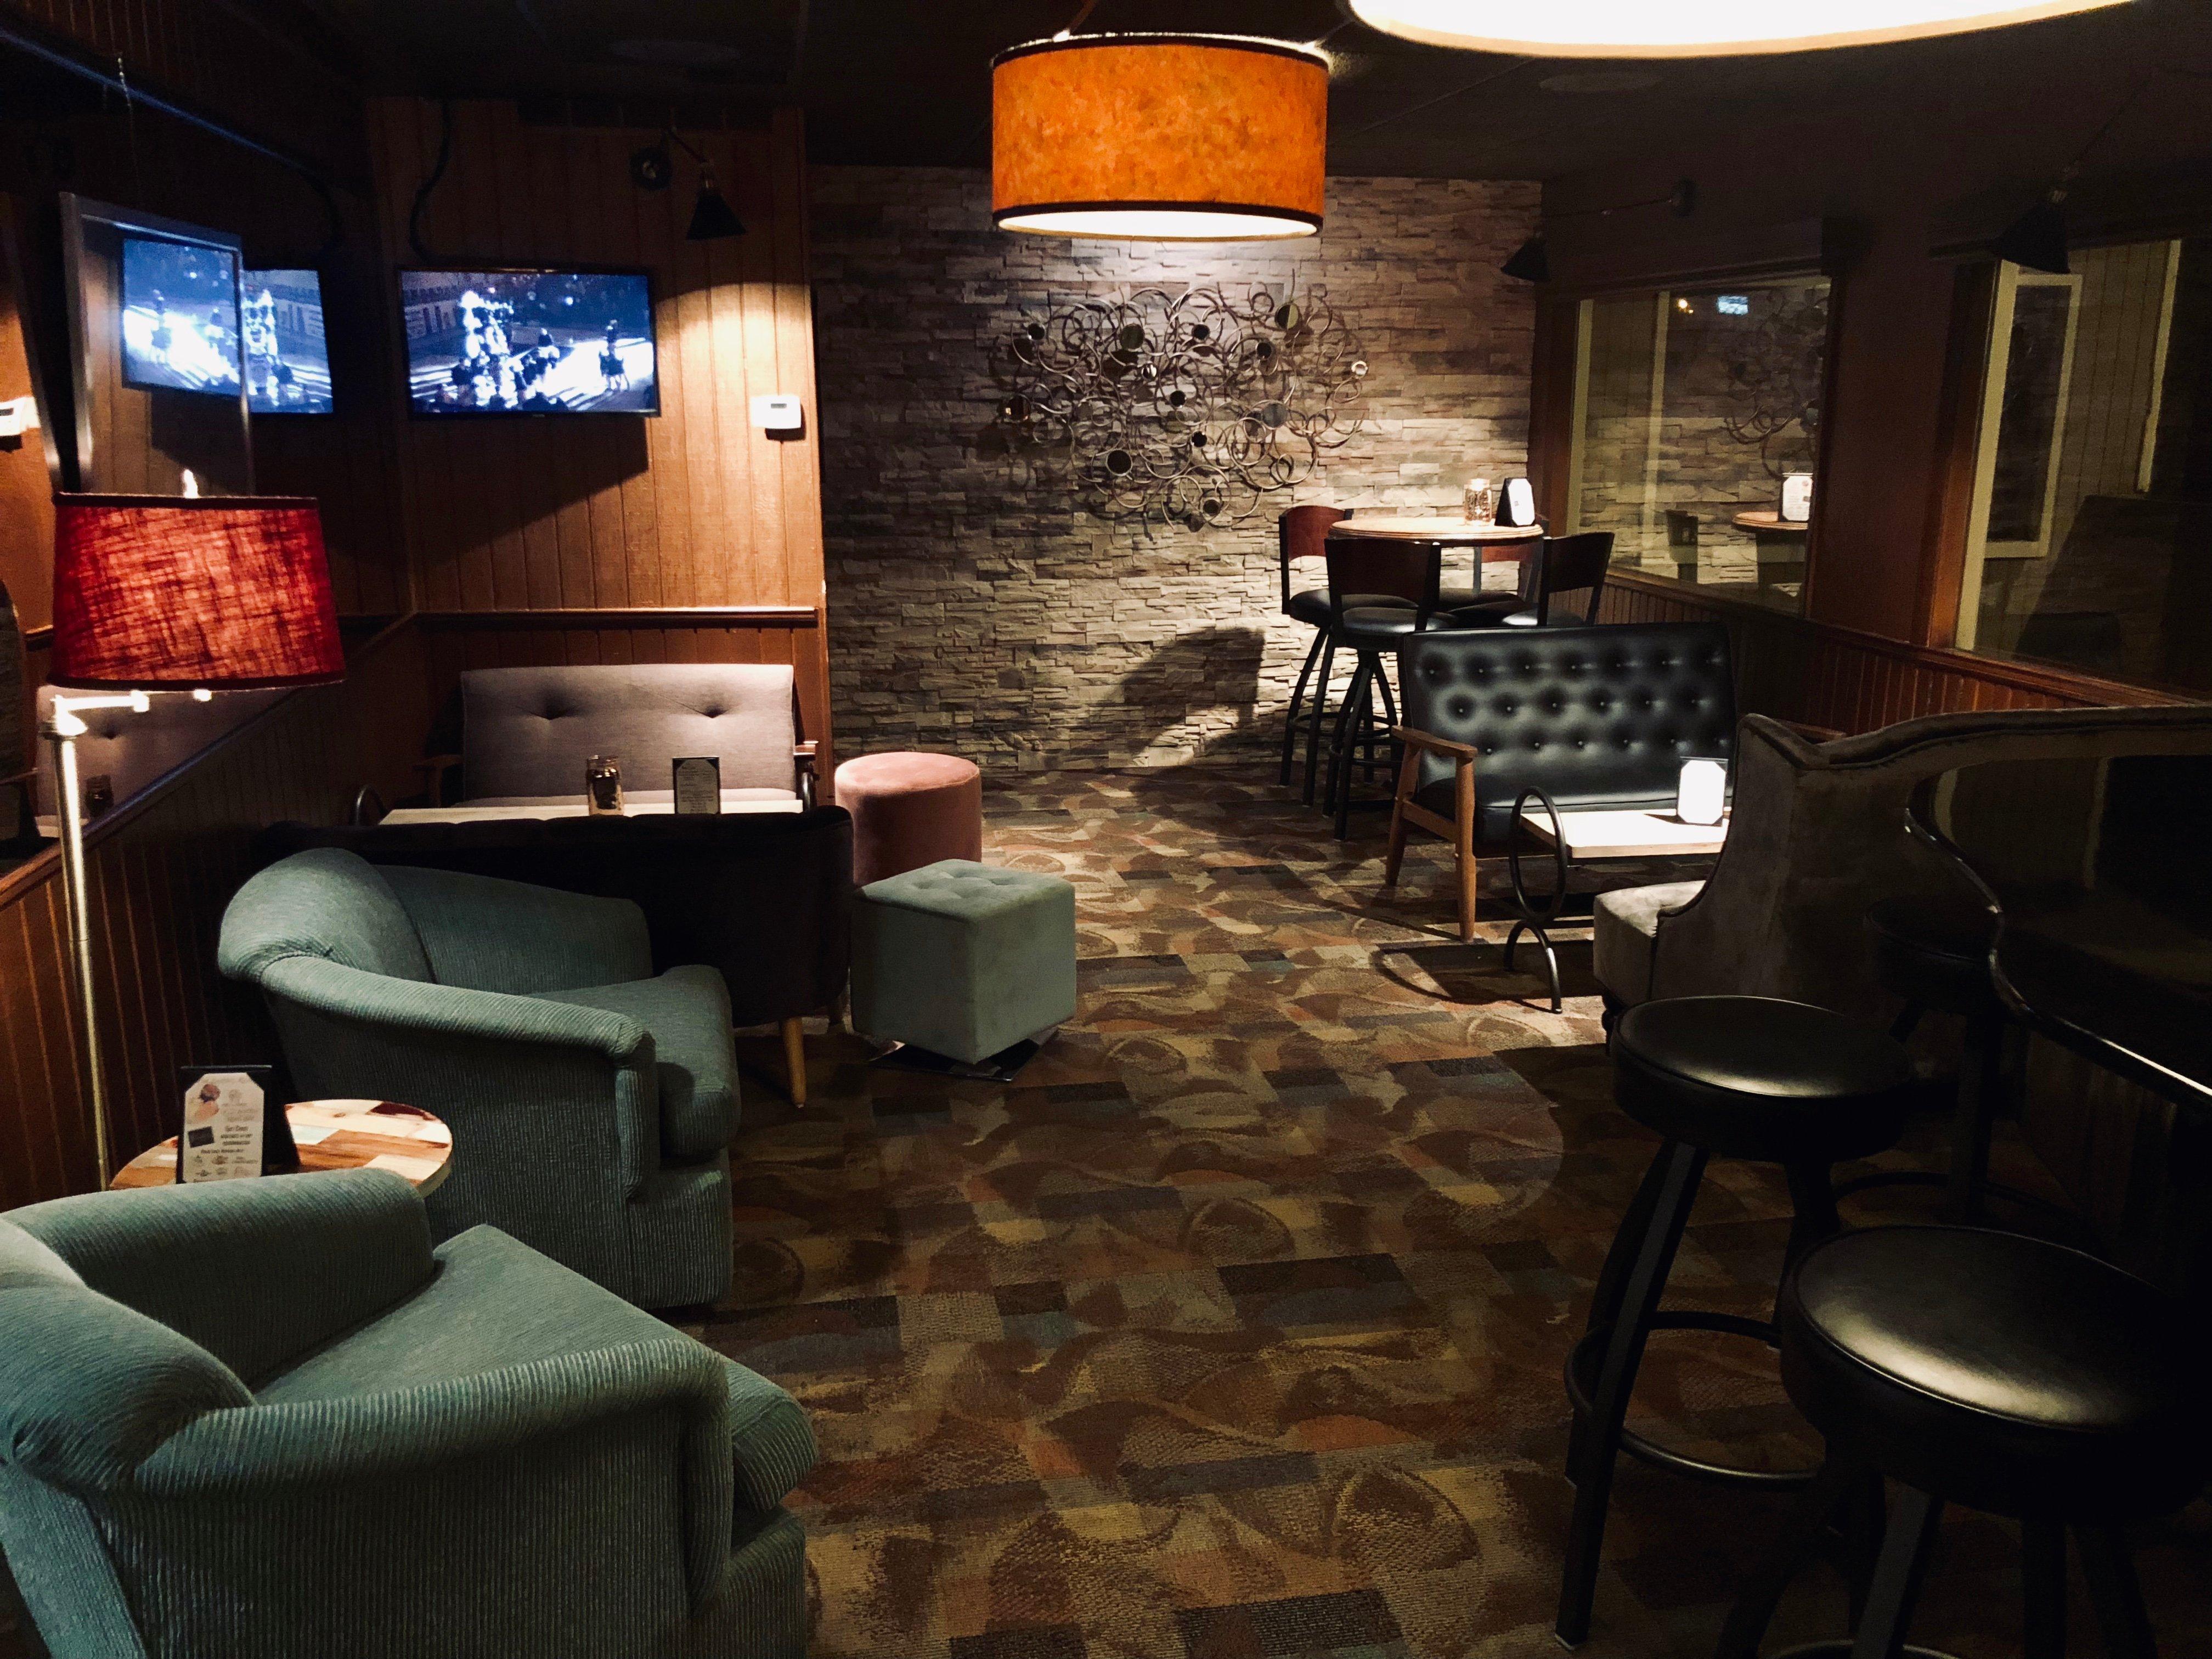 Top 5 Steakhouse food in Gravois Mills, Missouri, United States